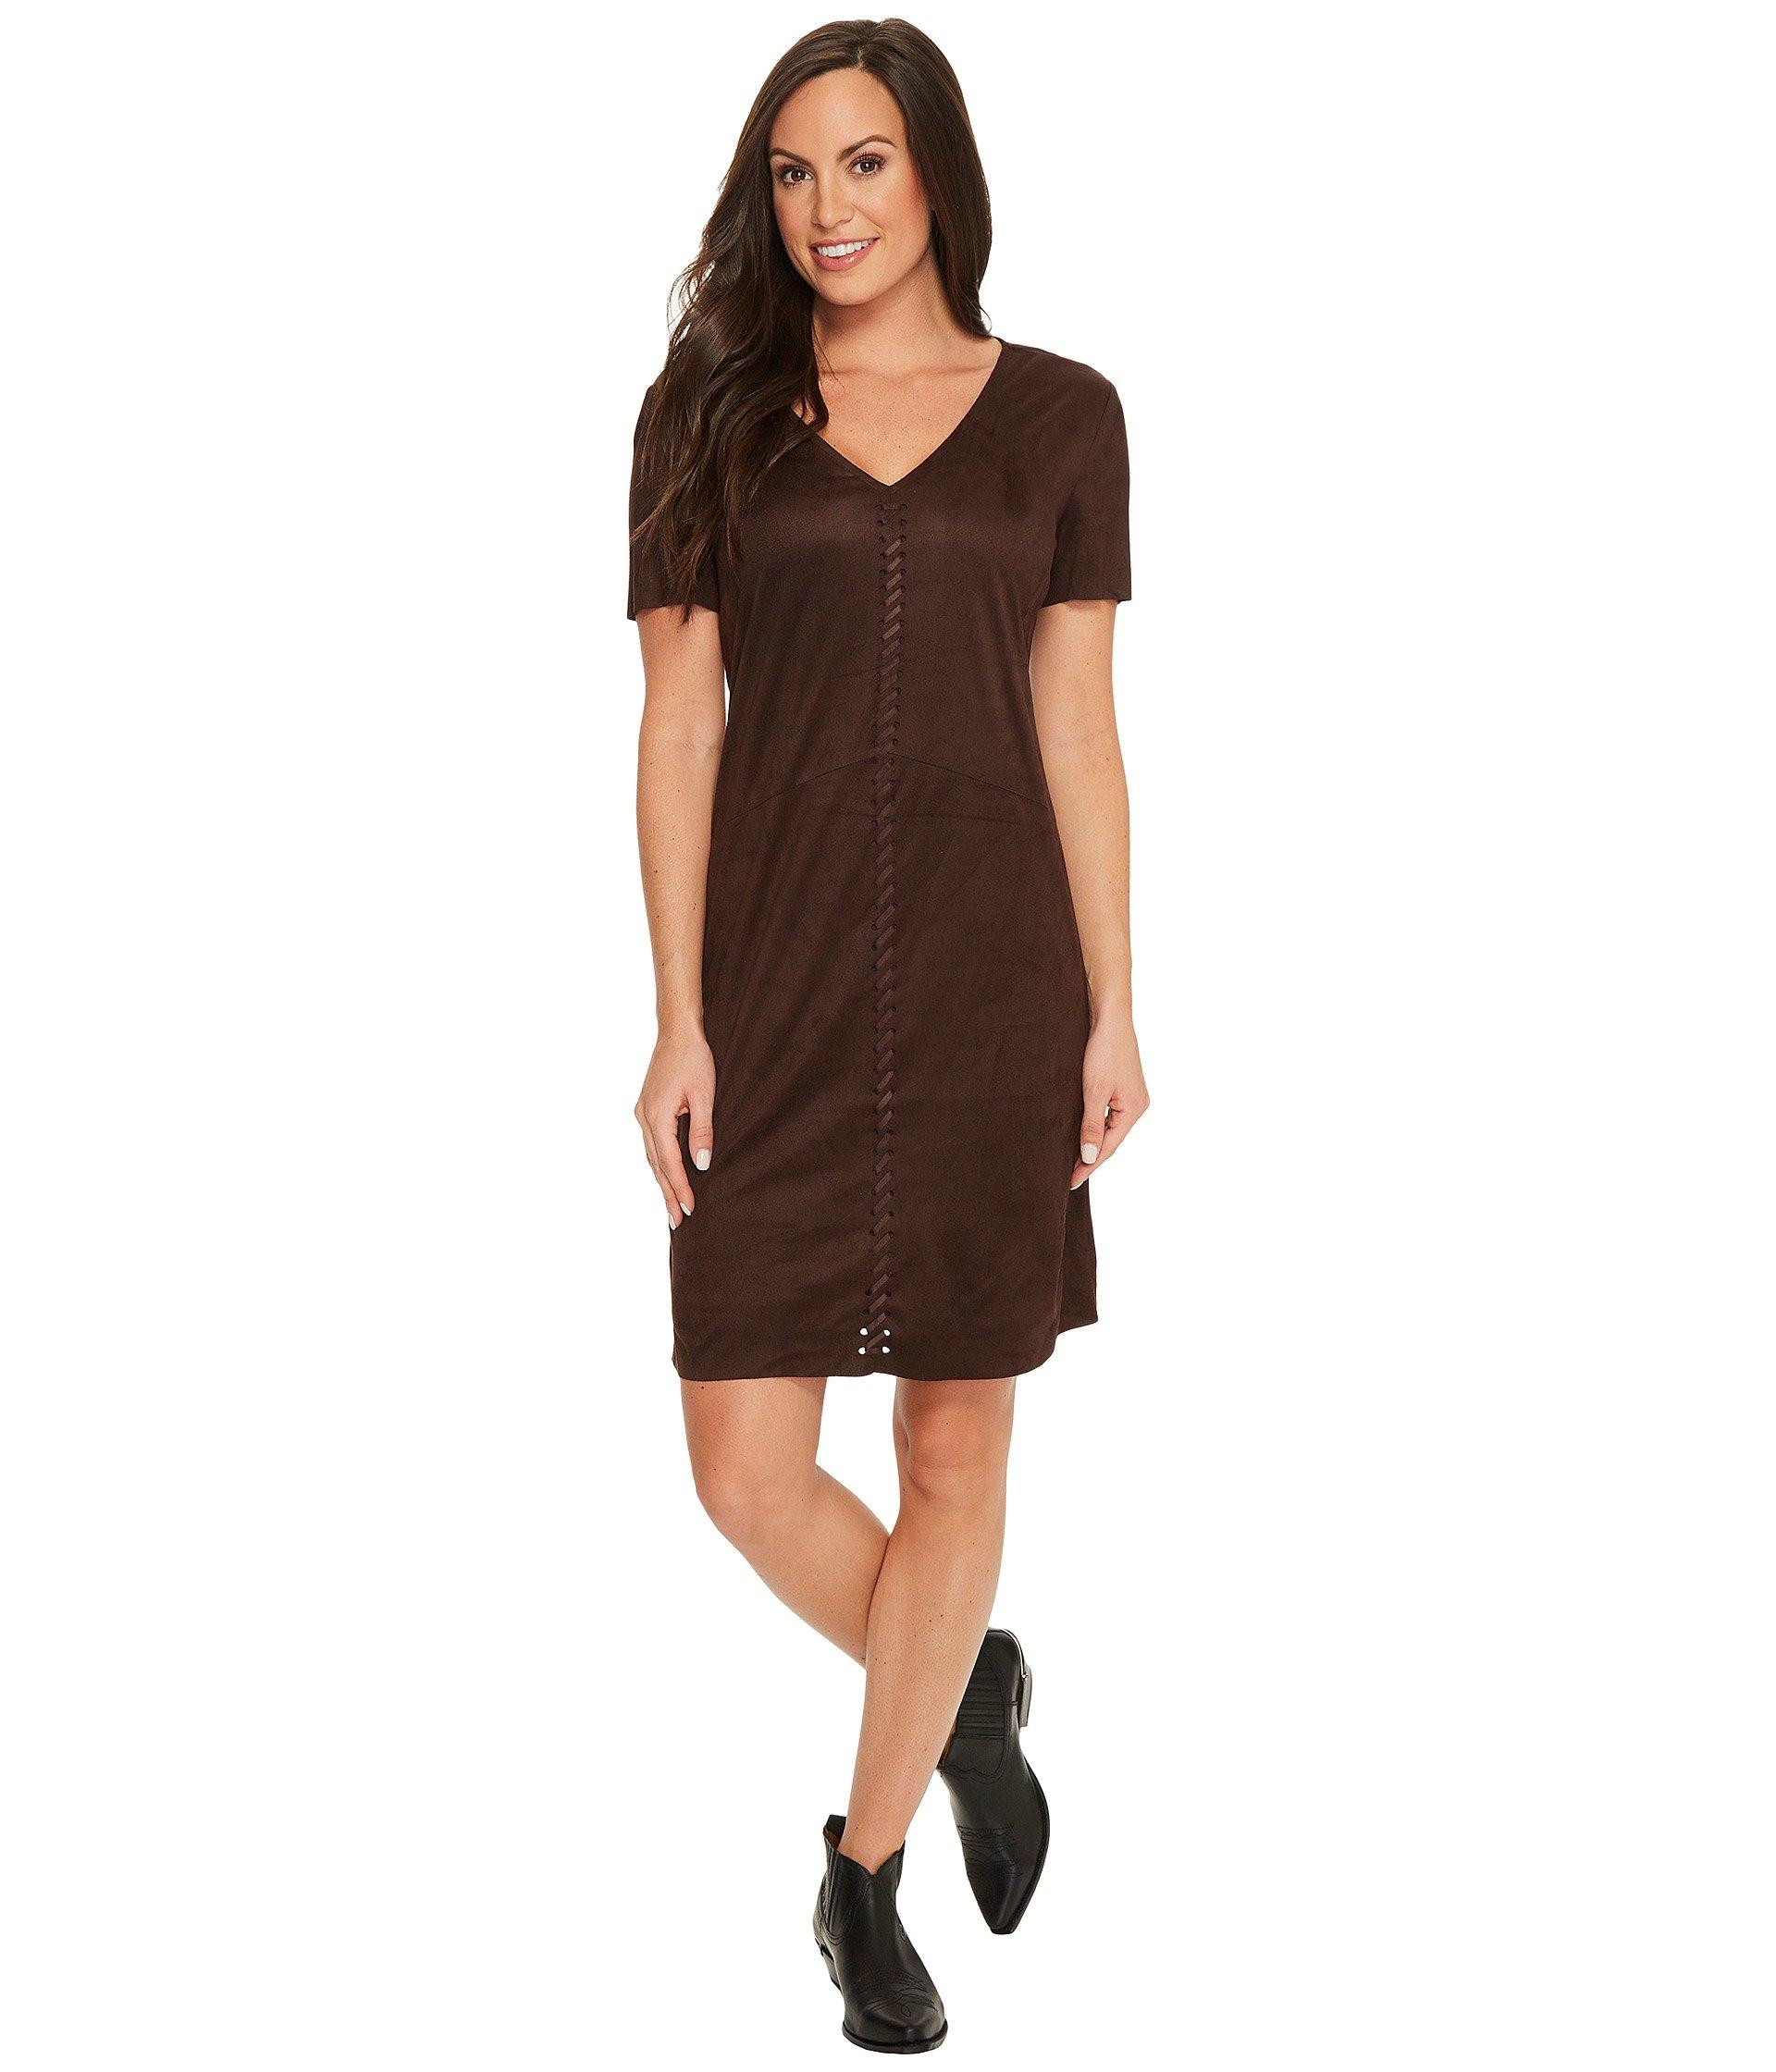 Afton Dress